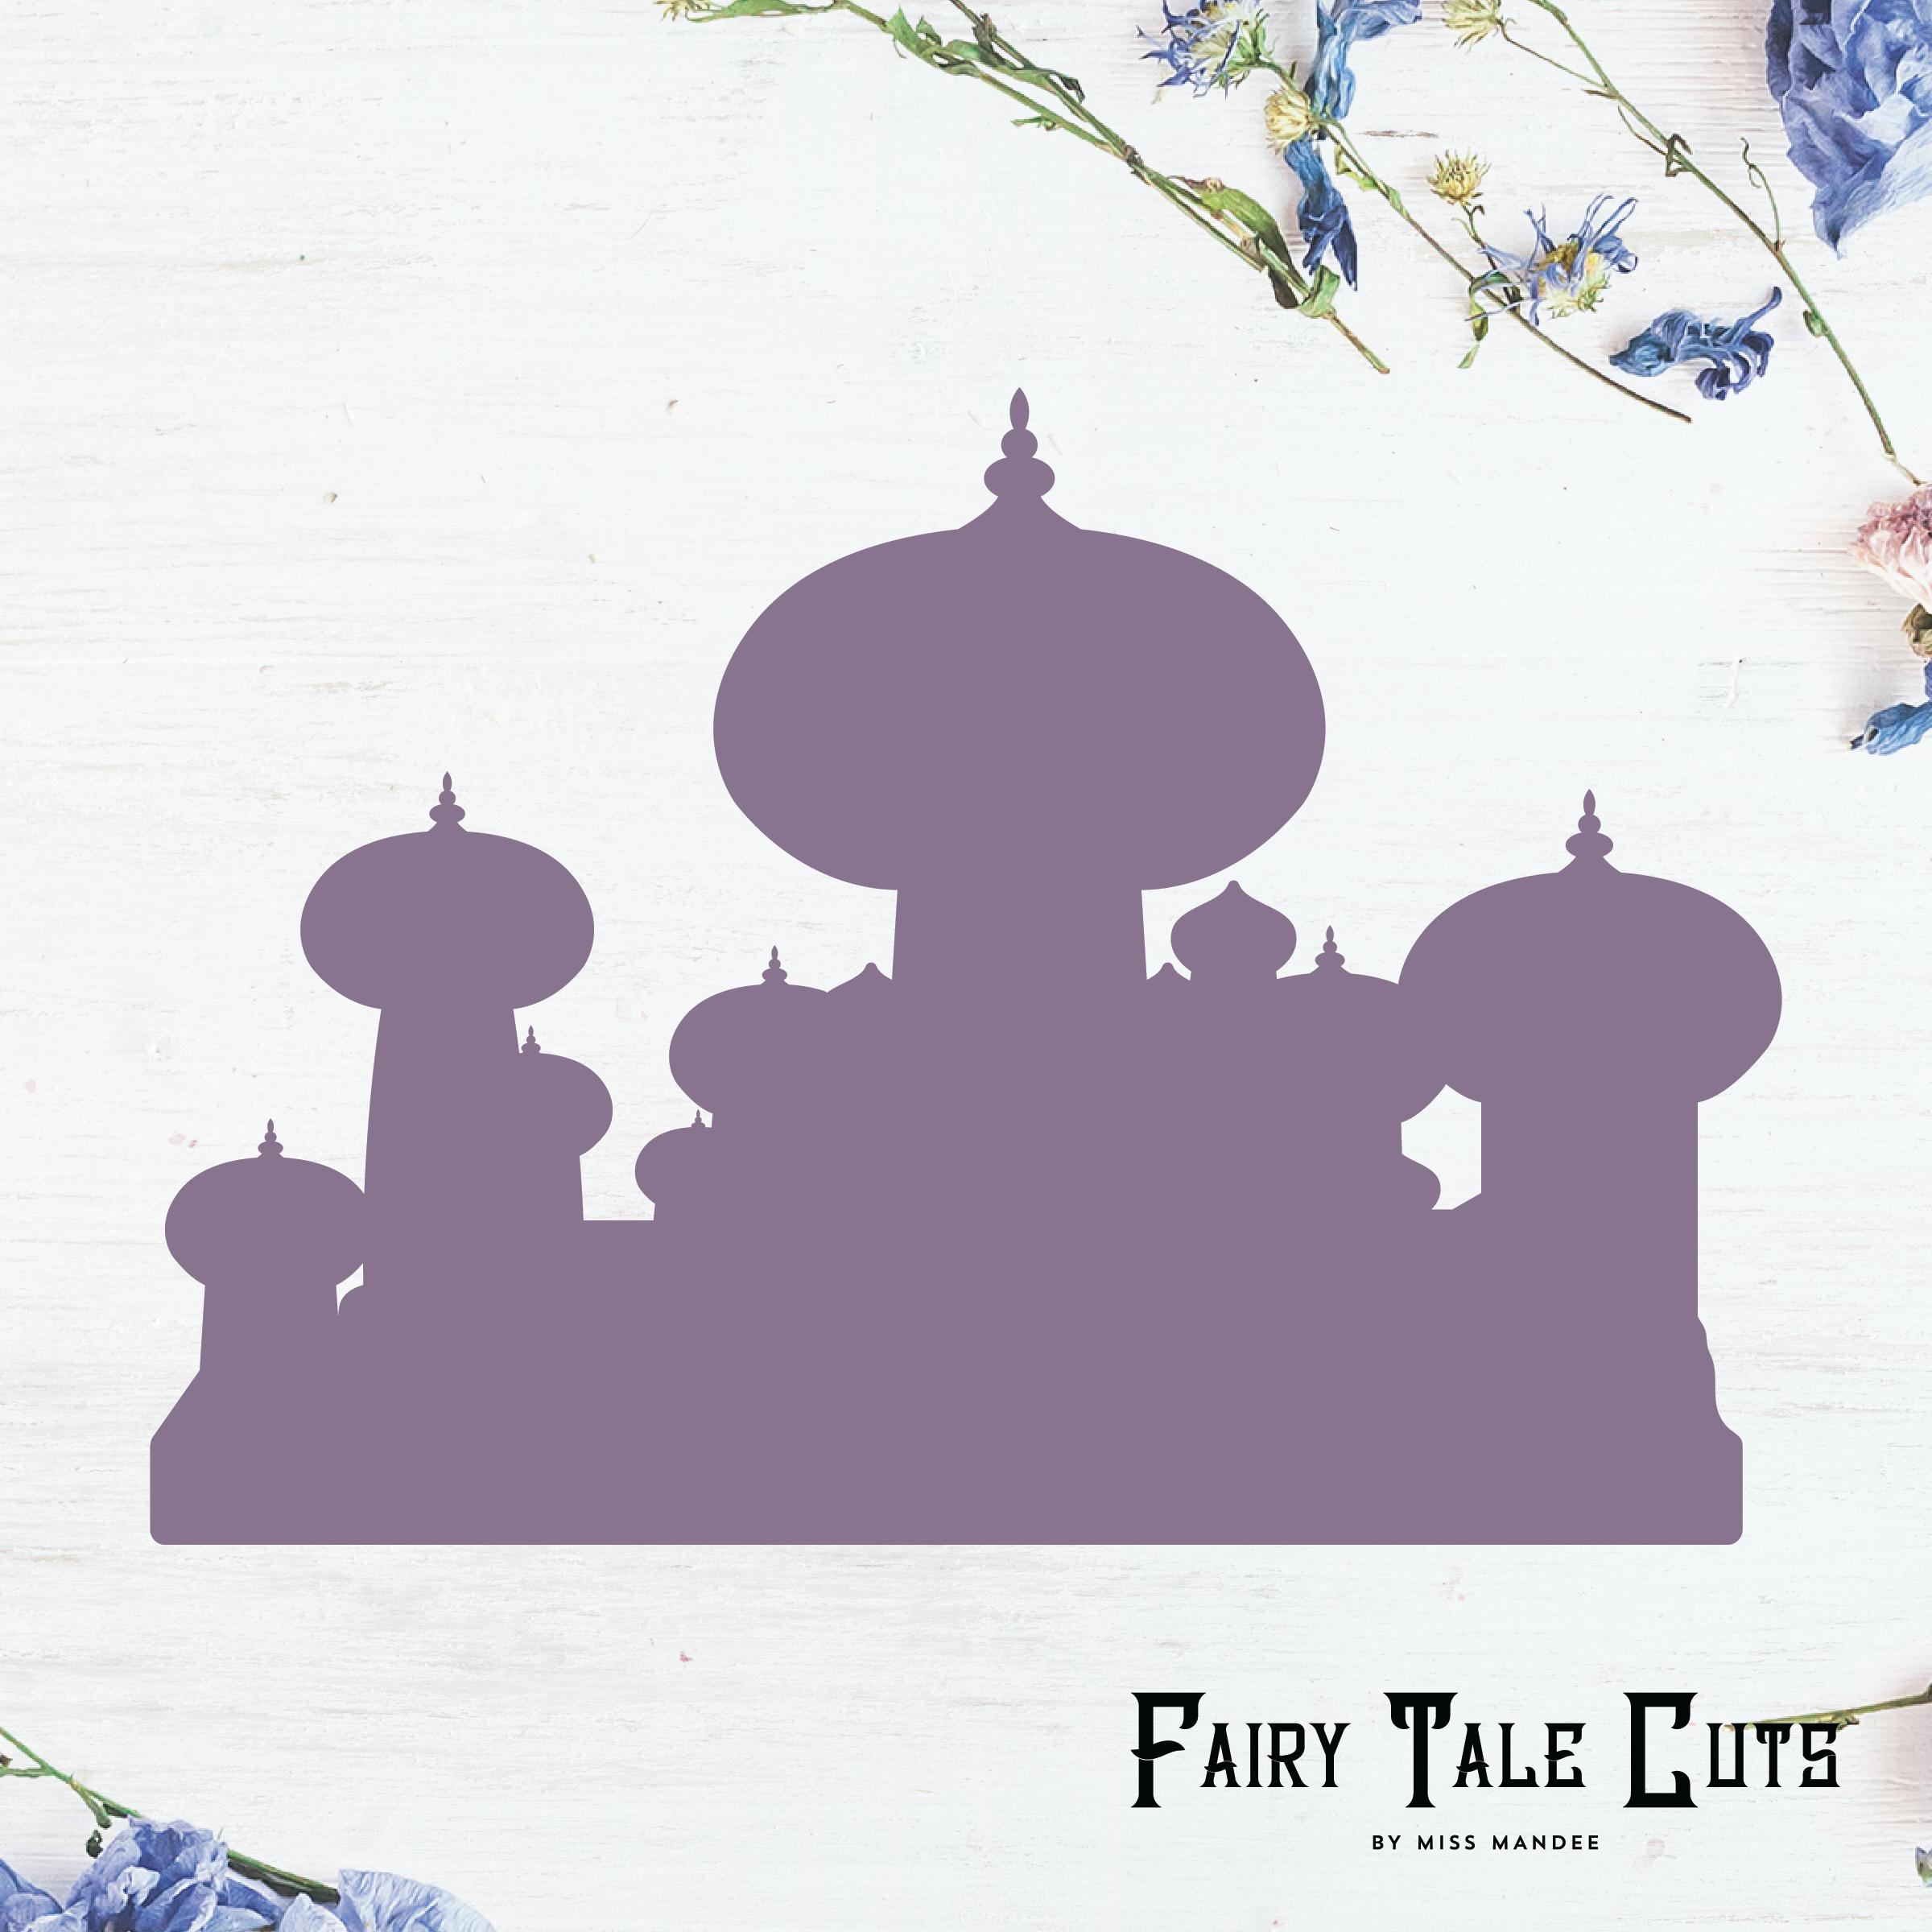 Jasmine's Castle Silhouette, Agrabah Palace, Aladdin